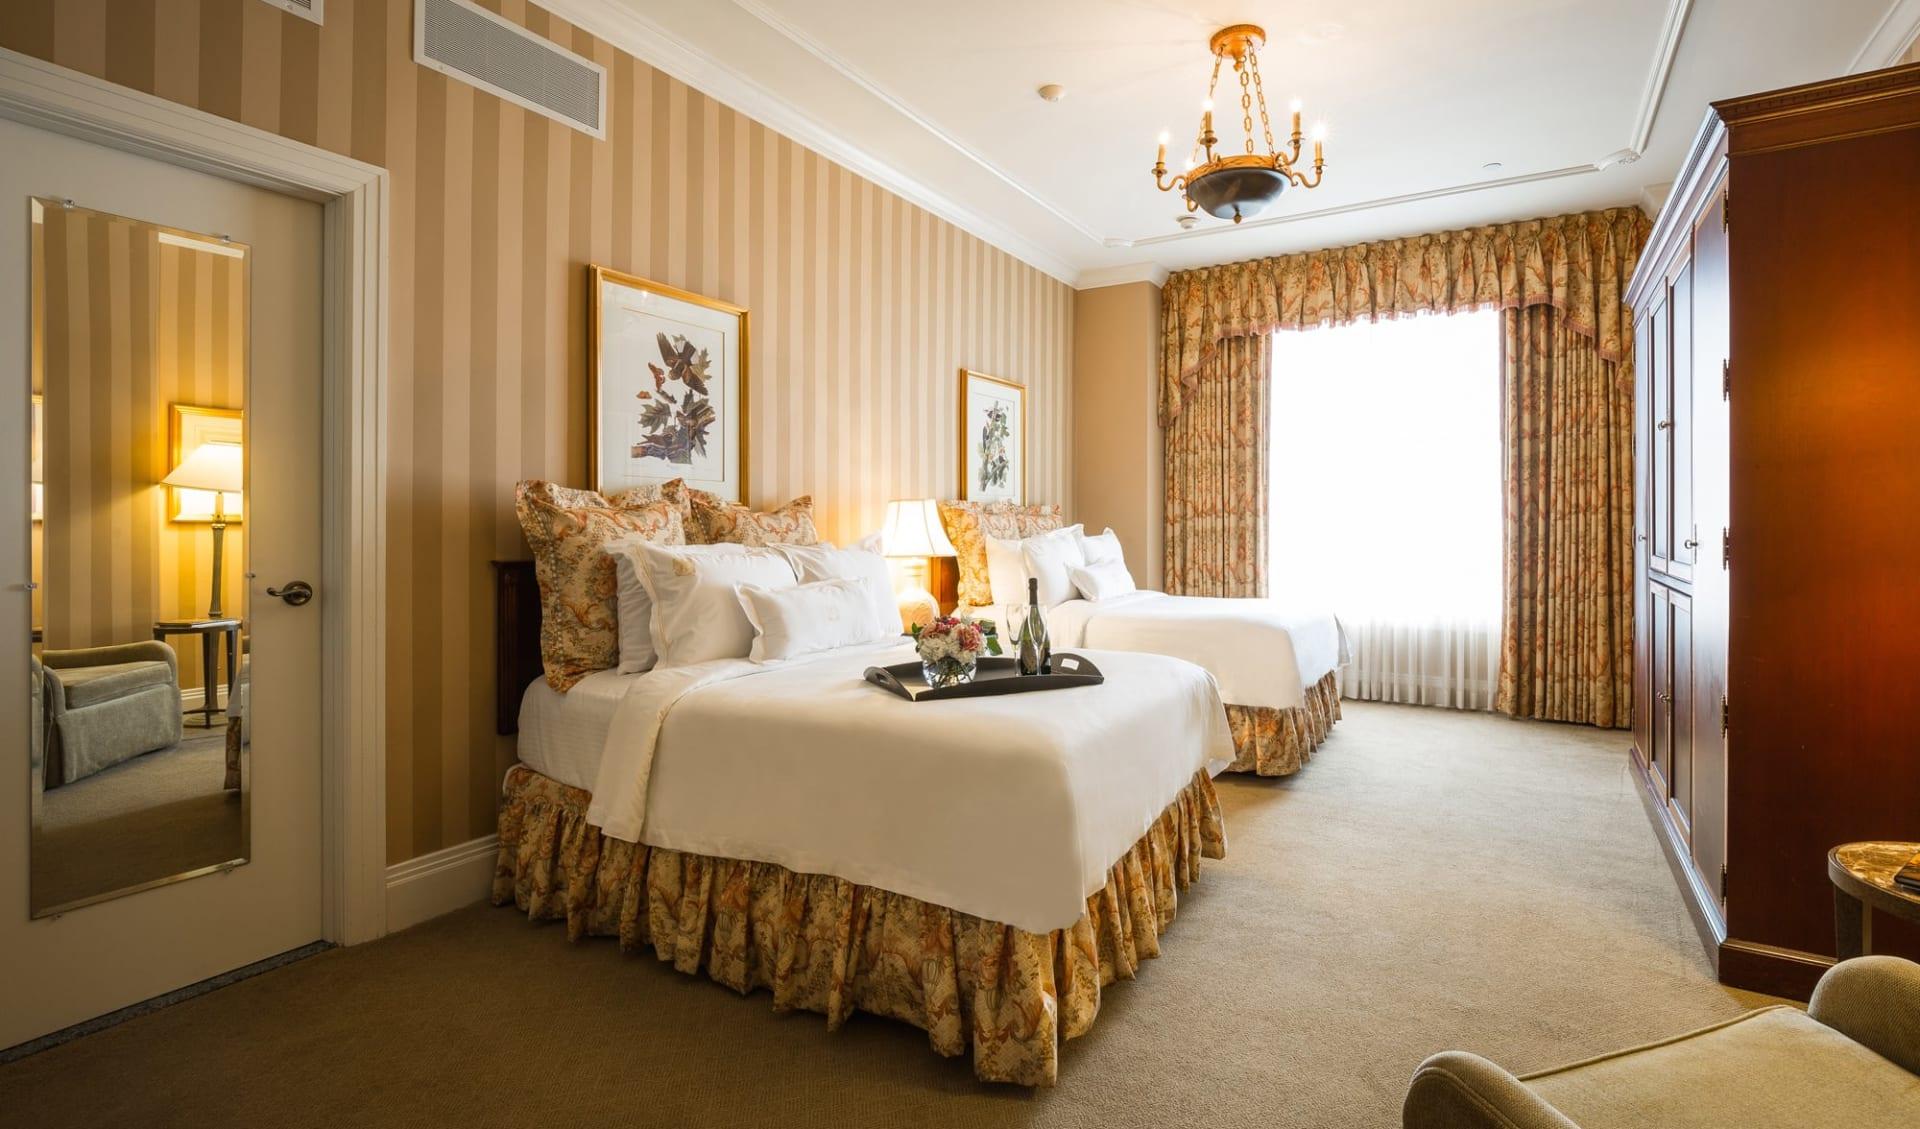 Monteleone in New Orleans:  Monteleone - Prefered Room